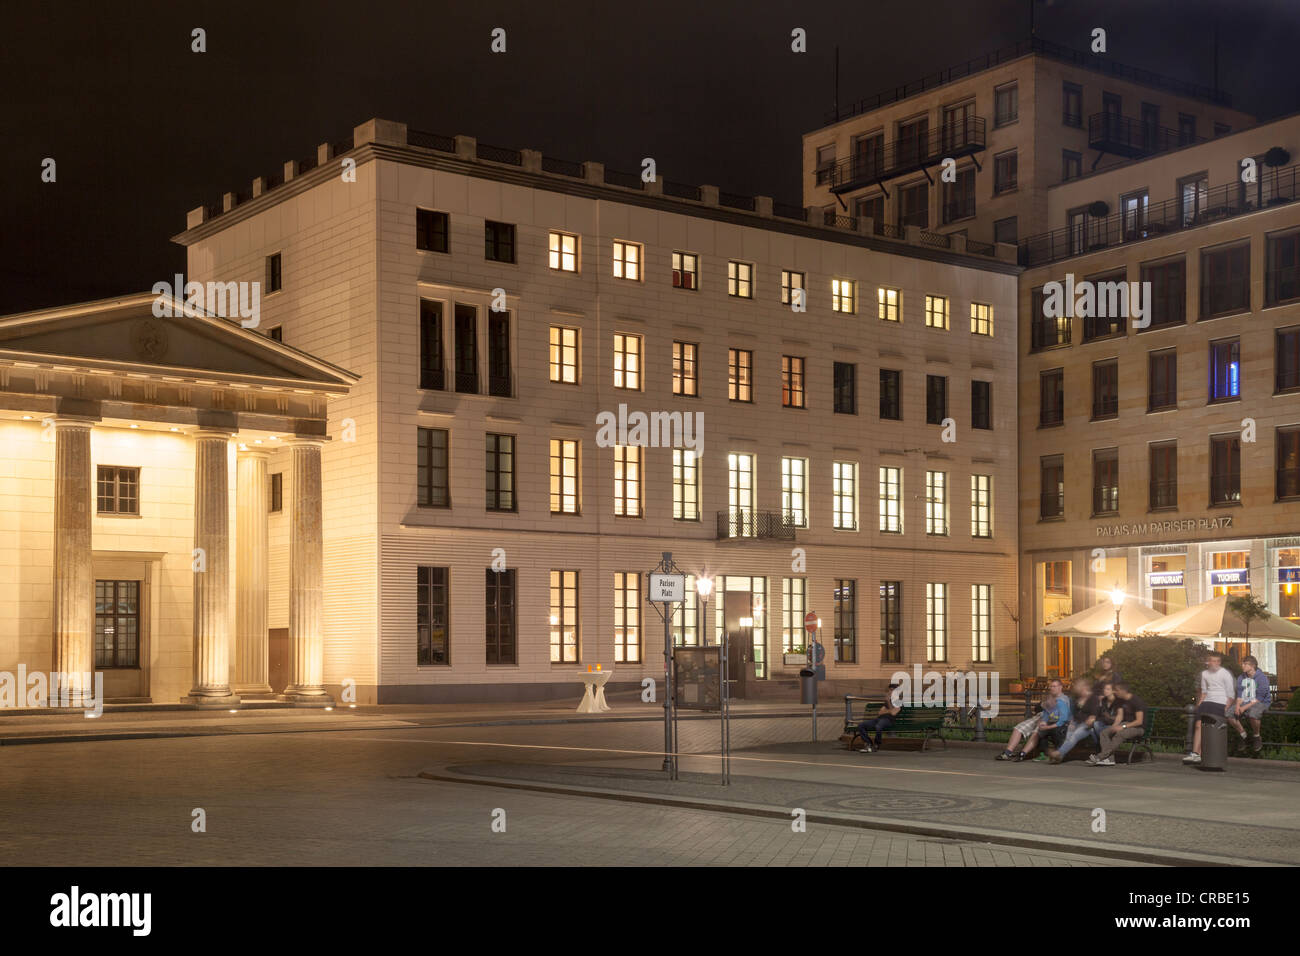 Max LiebermannHaus, Pariser Platz, Berlin, Germany - Stock Image